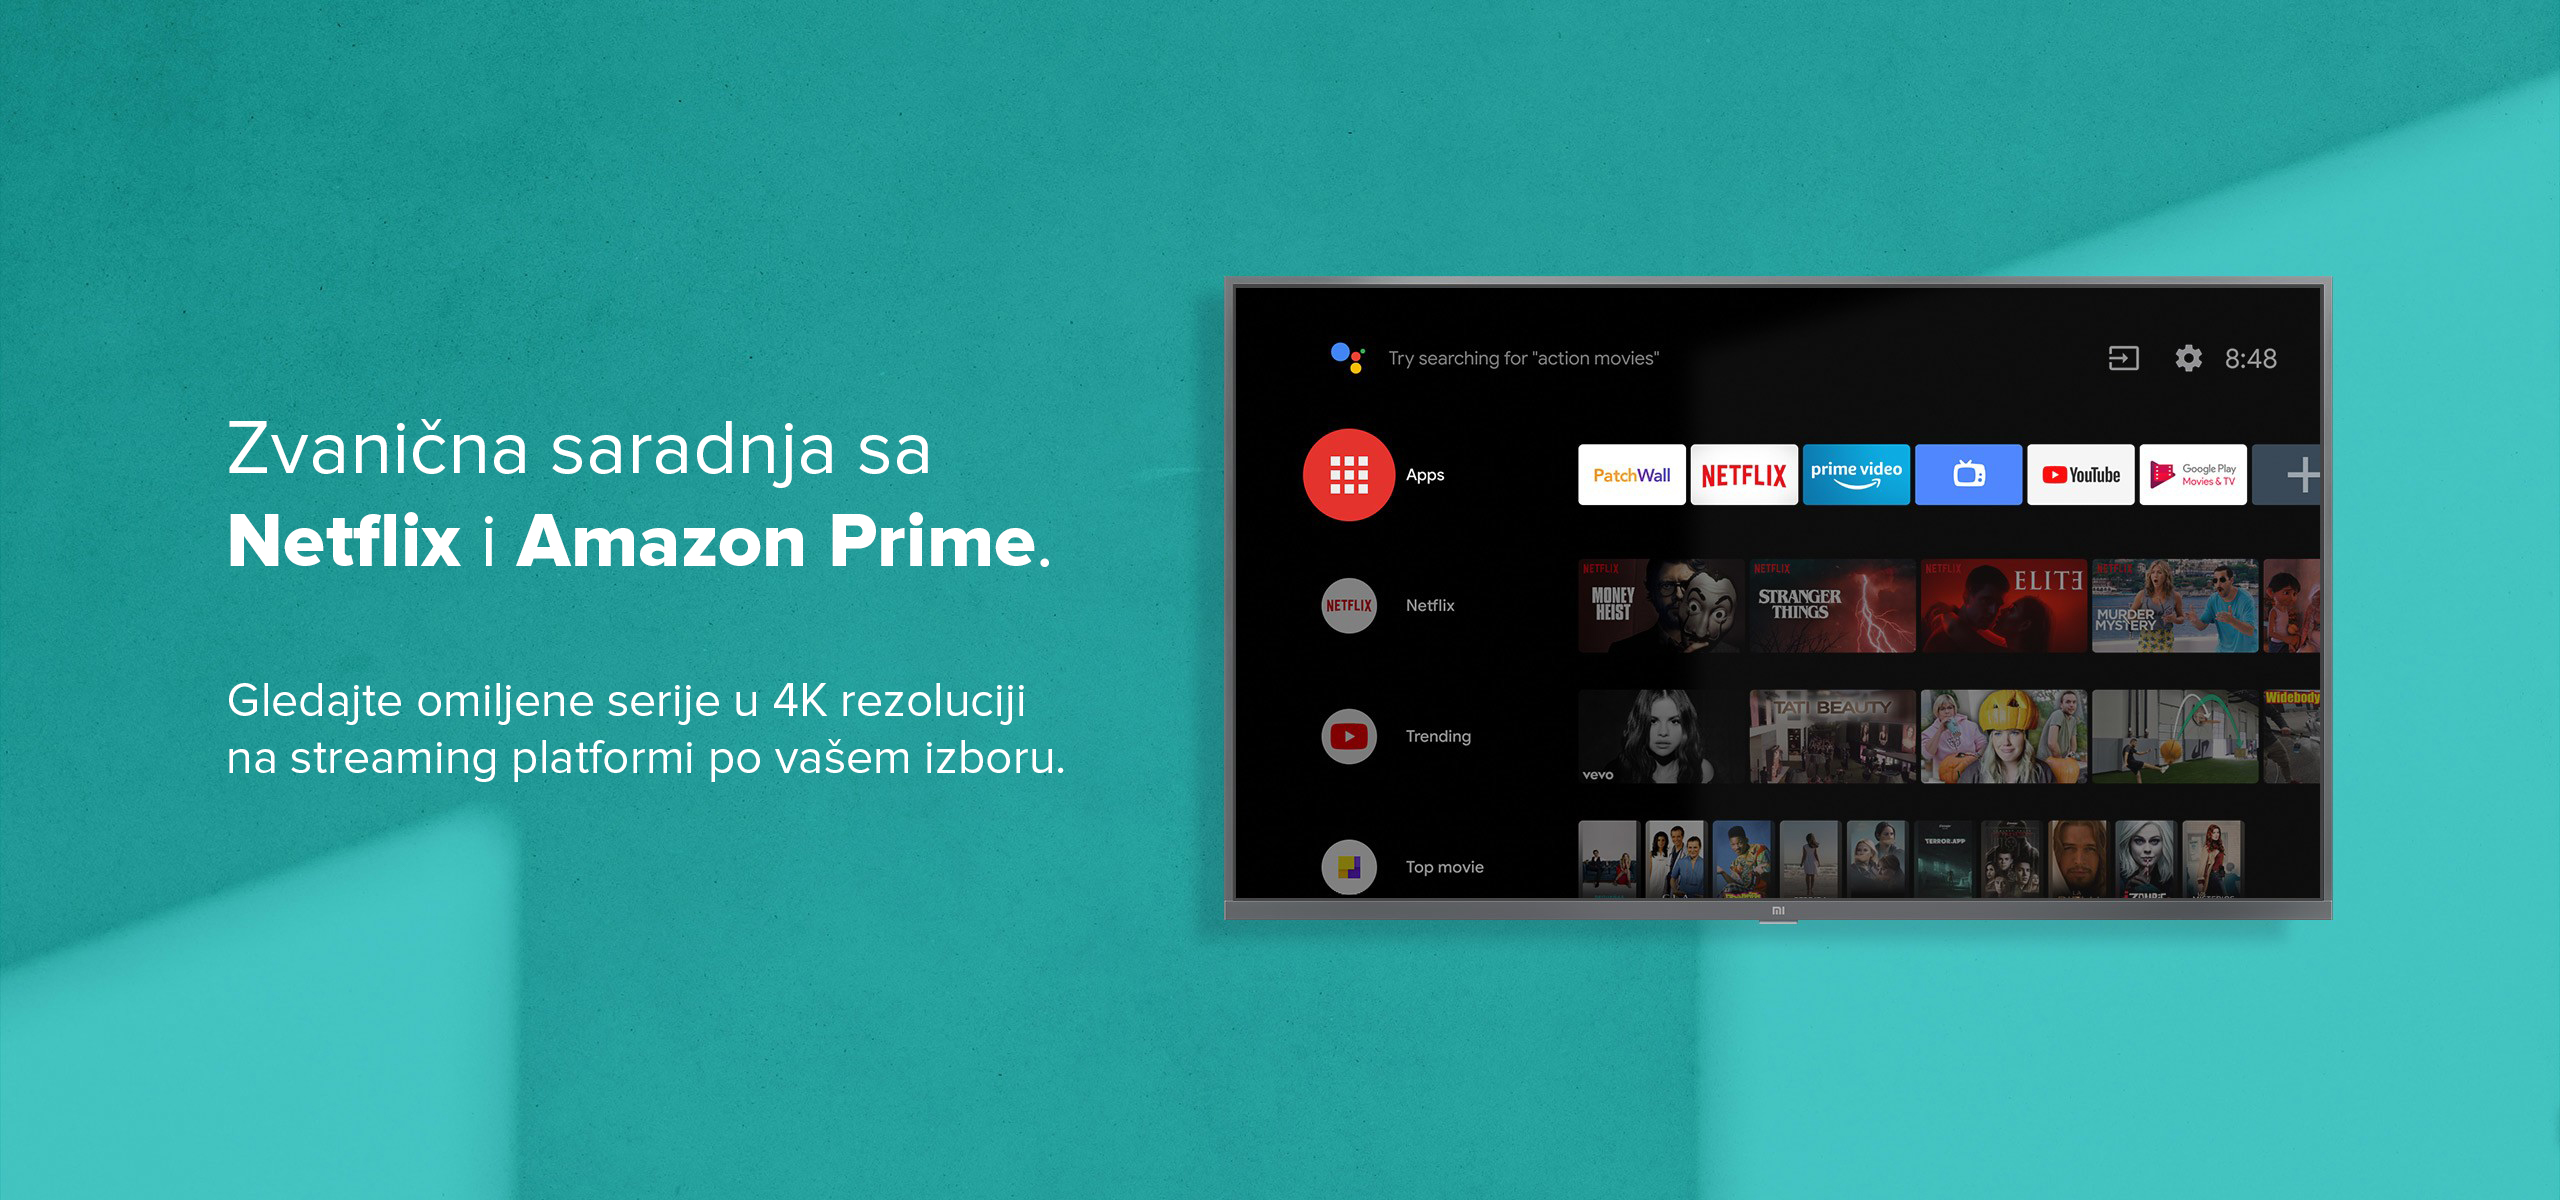 https://mi-srbija.rs/storage/media/2020/11/5/4ba5172c-60bb-4af3-a338-2c16823aa75d.jpg